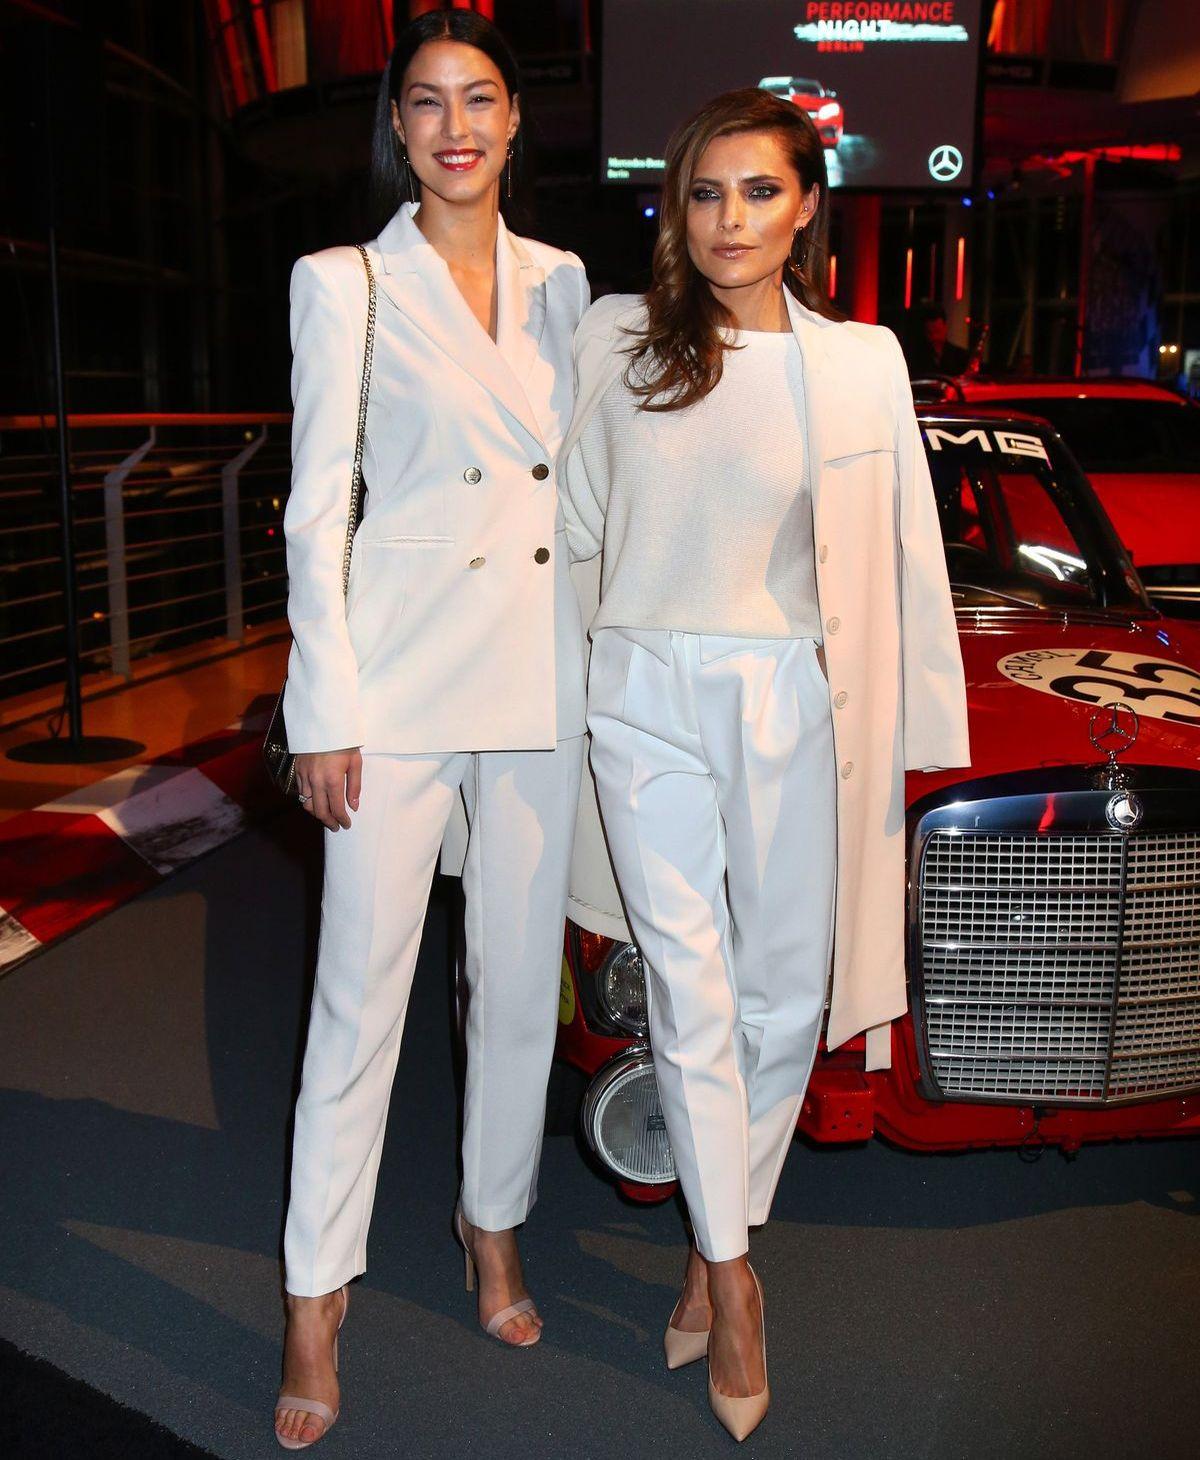 Rebecca Mir, Sophia Thomalla, Mercedes-Benz 300 SEL AMG (Rote Sau)